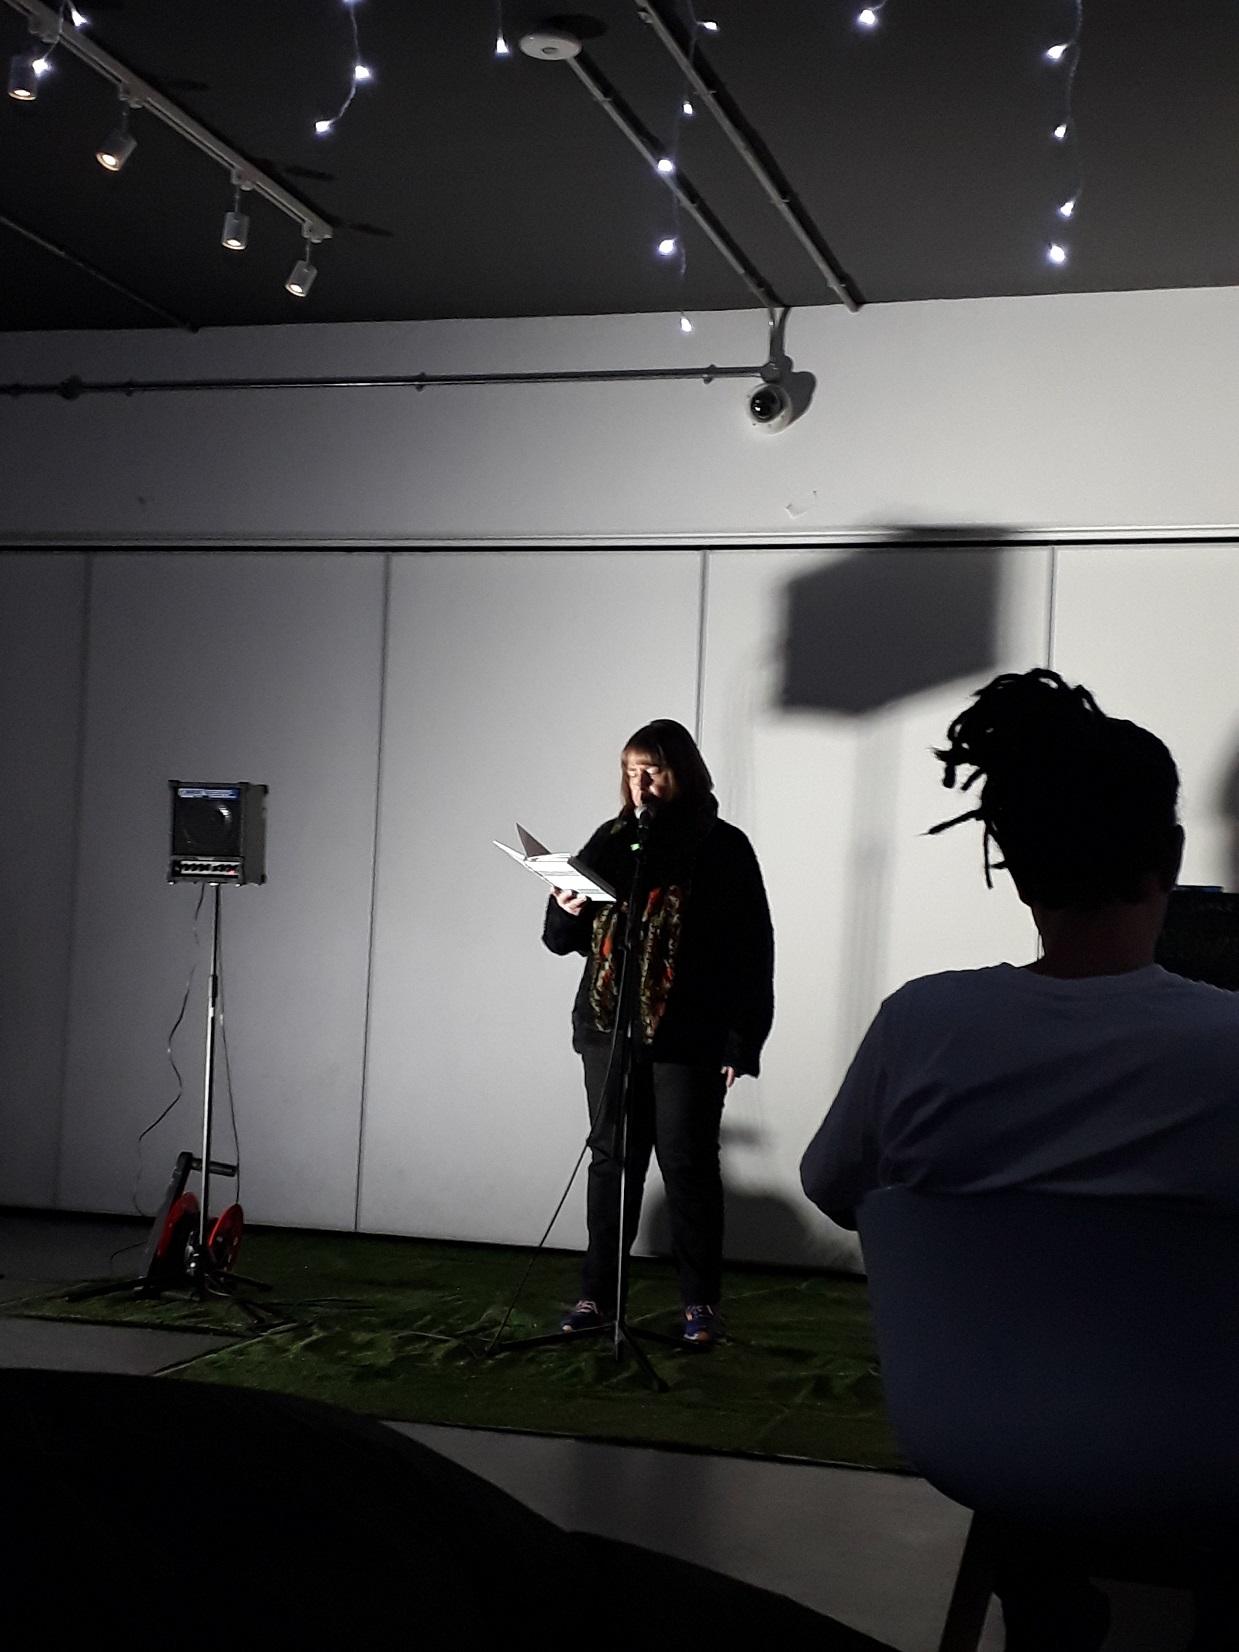 The Enduring Eye (Shackleton photographic exhibition), The Wilson Art Gallery, Cheltenham, February 2019